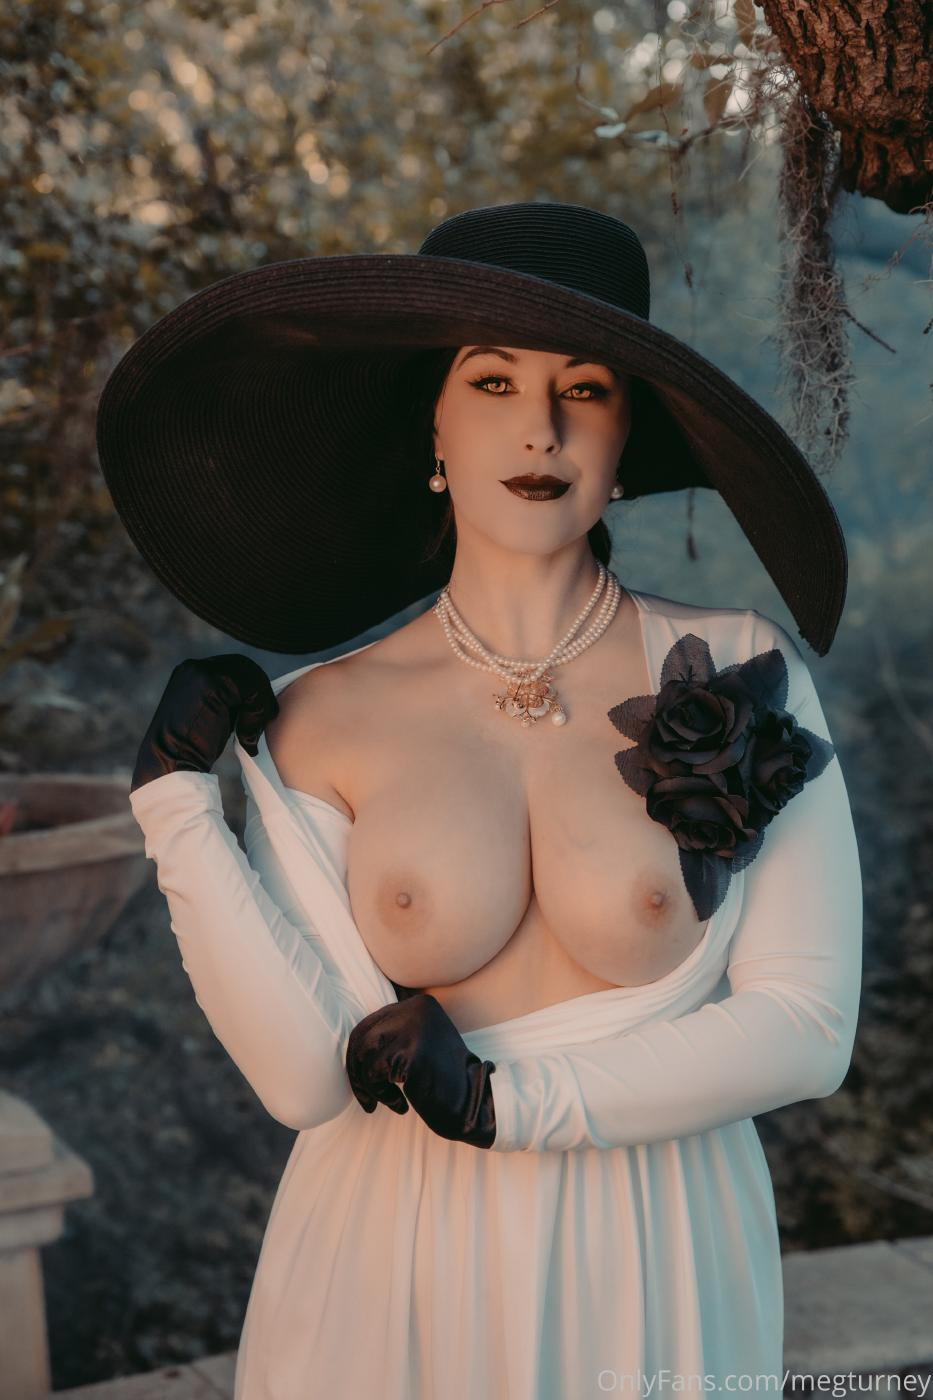 Meg Turney Lady Dimitrescu Cosplay Onlyfans Set Leaked 0047